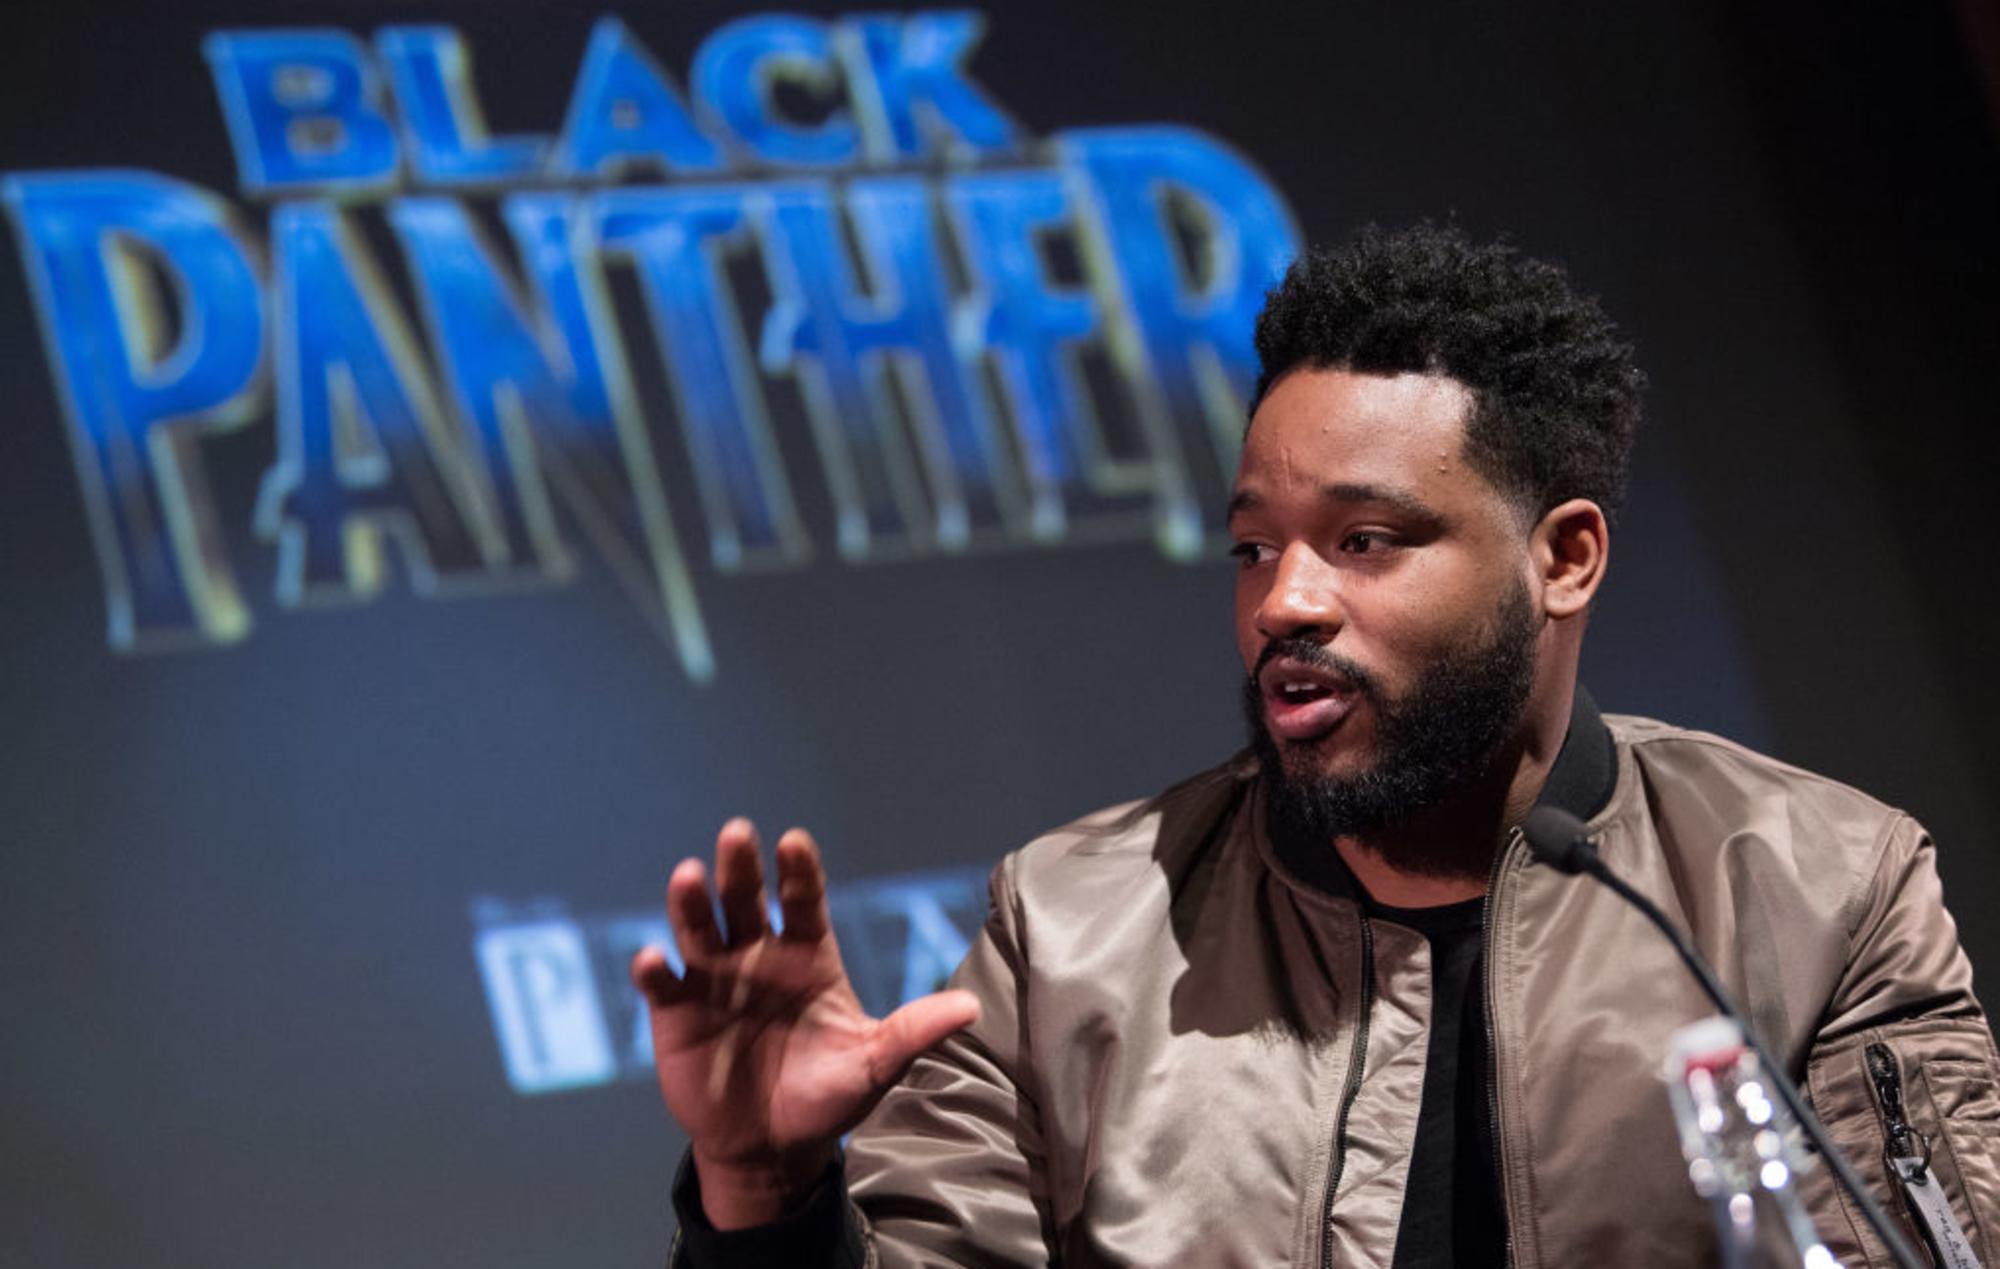 'Black Panther' director Ryan Coogler begins work on new comic book movie